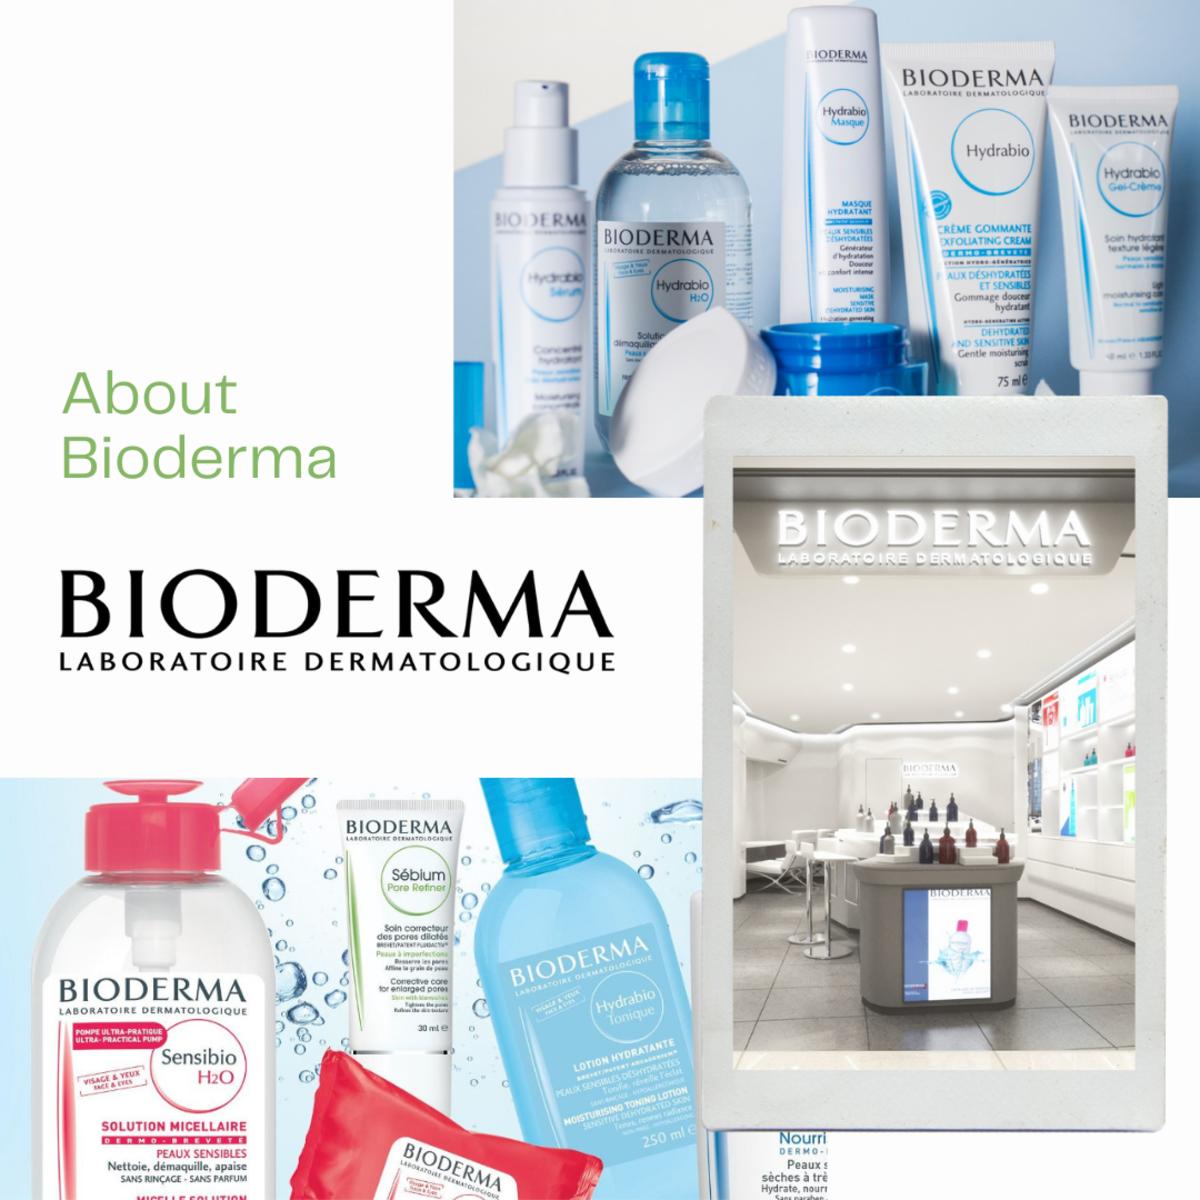 bioderma-sebium-hydra-moisturizer-review